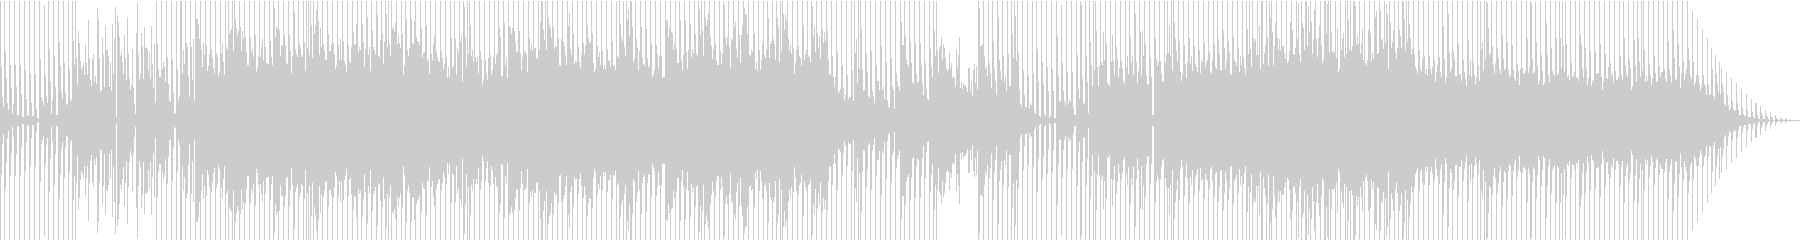 Alpha-Libraの未再生の波形